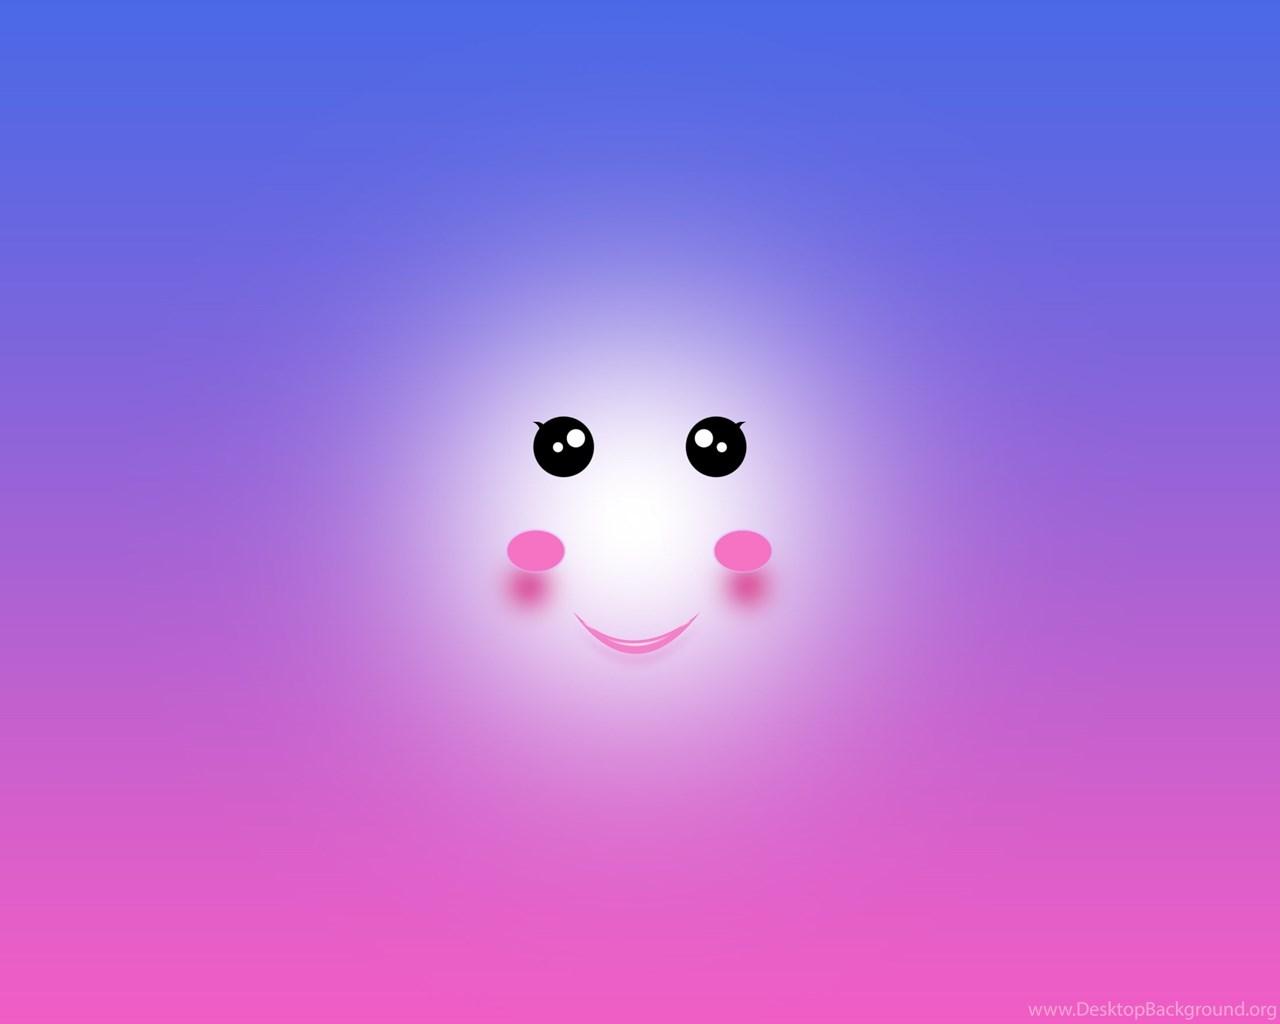 Cute Kawaii IPhone Wallpapers By Folicorow16 On DeviantArt